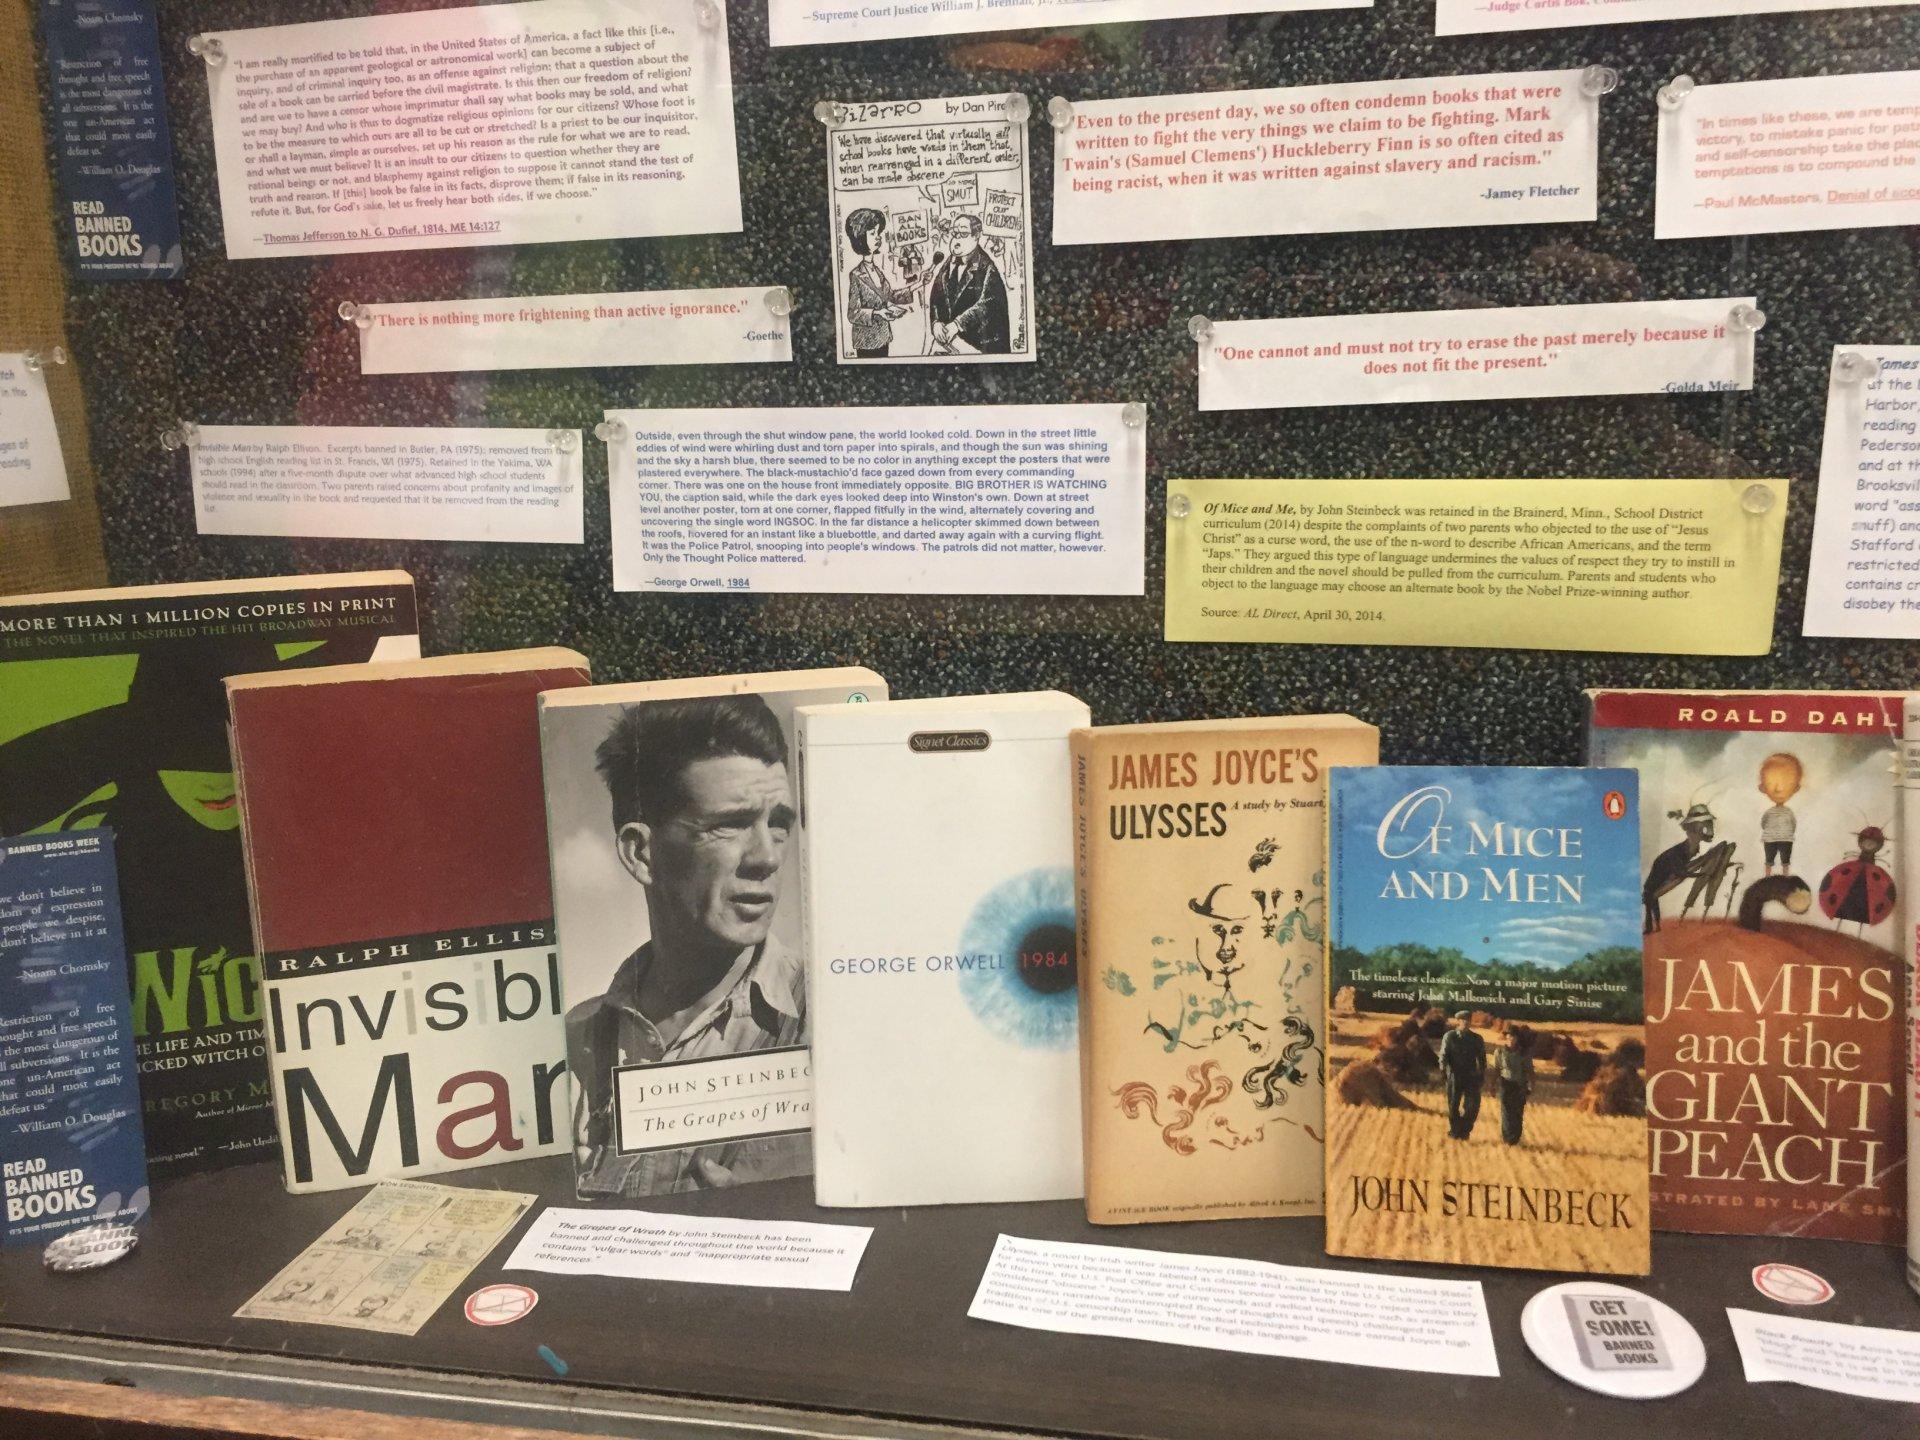 Library including some popular banned books titles. Photo credit: Lora Neshovska